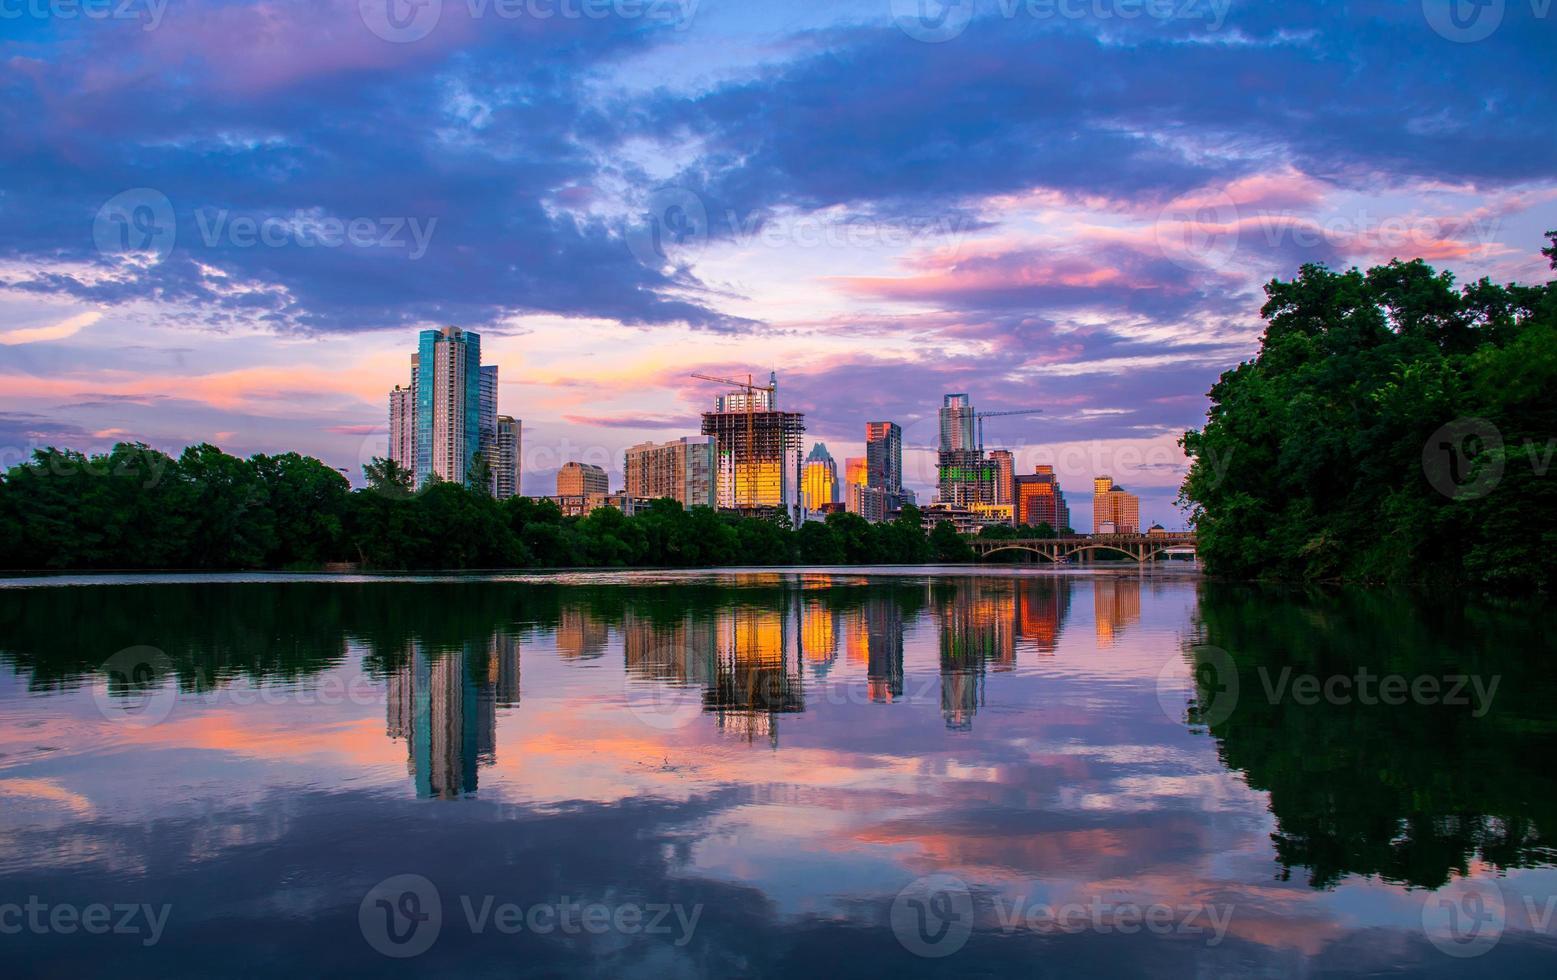 Austin Leben Lou Neff Punkt Spiegelreflexion Sonnenuntergang 2015 foto